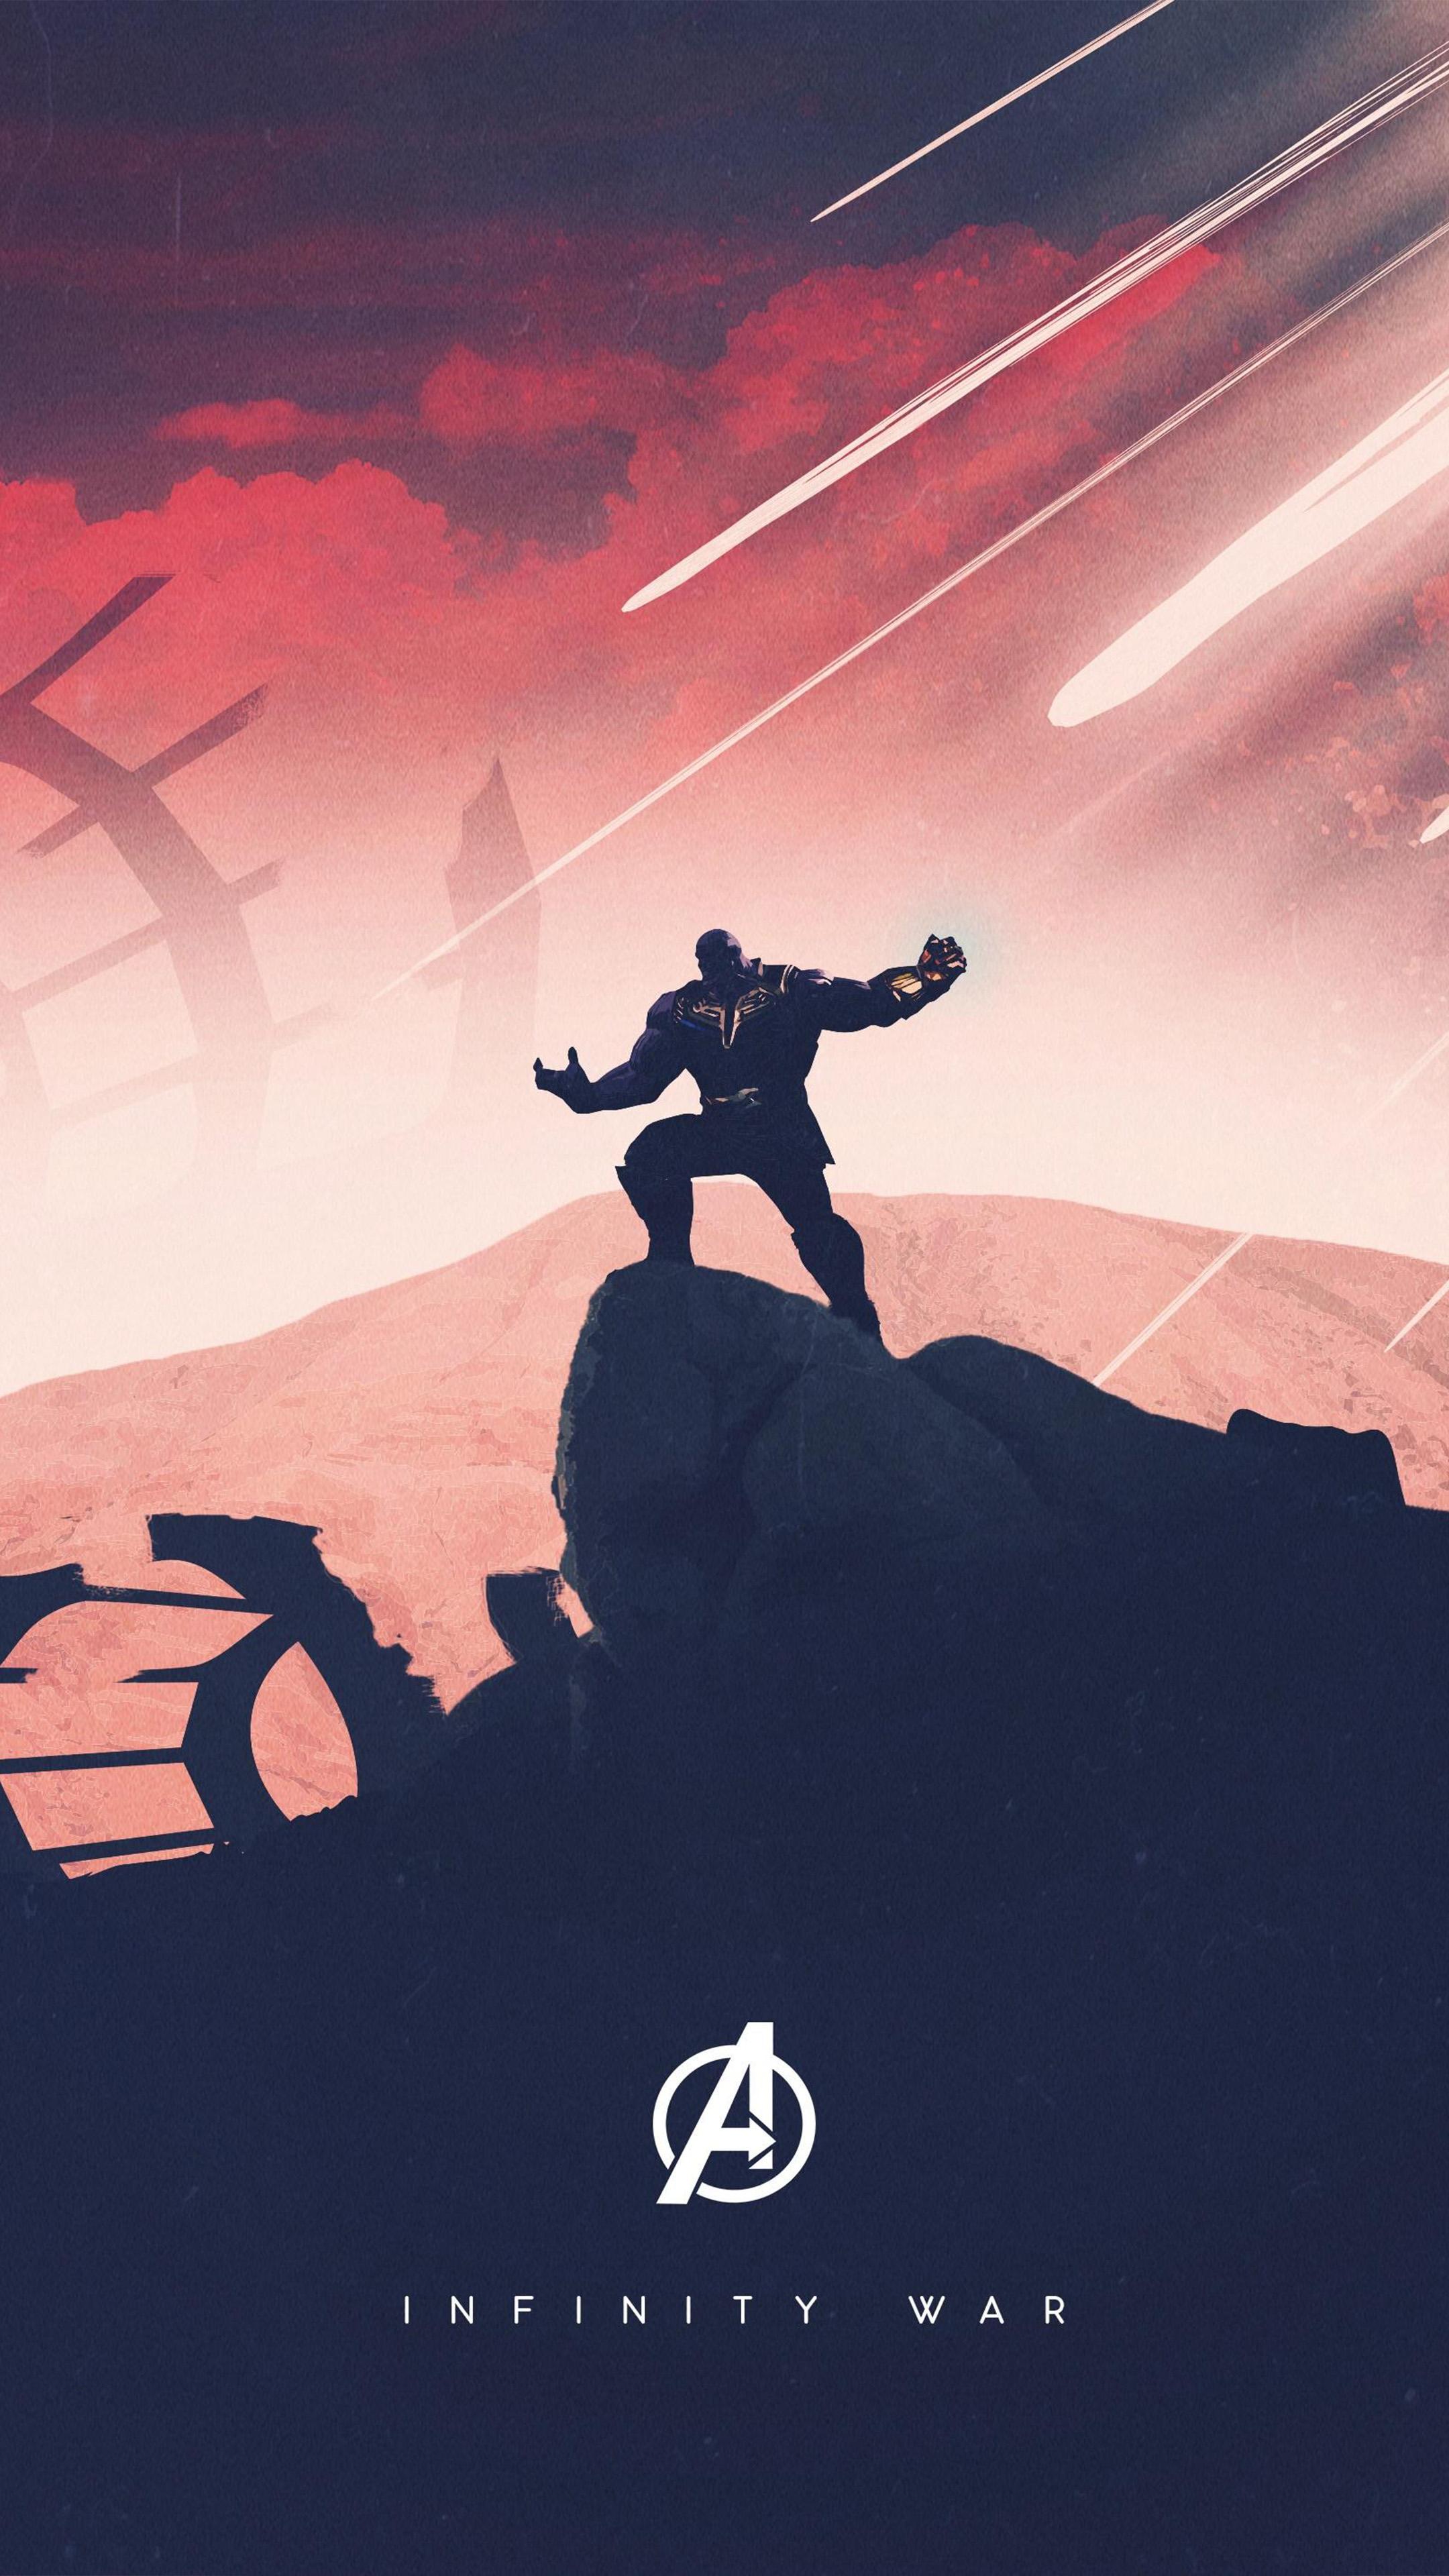 Thanos Avengers Infinity War Artwork Free 4K Ultra HD ...